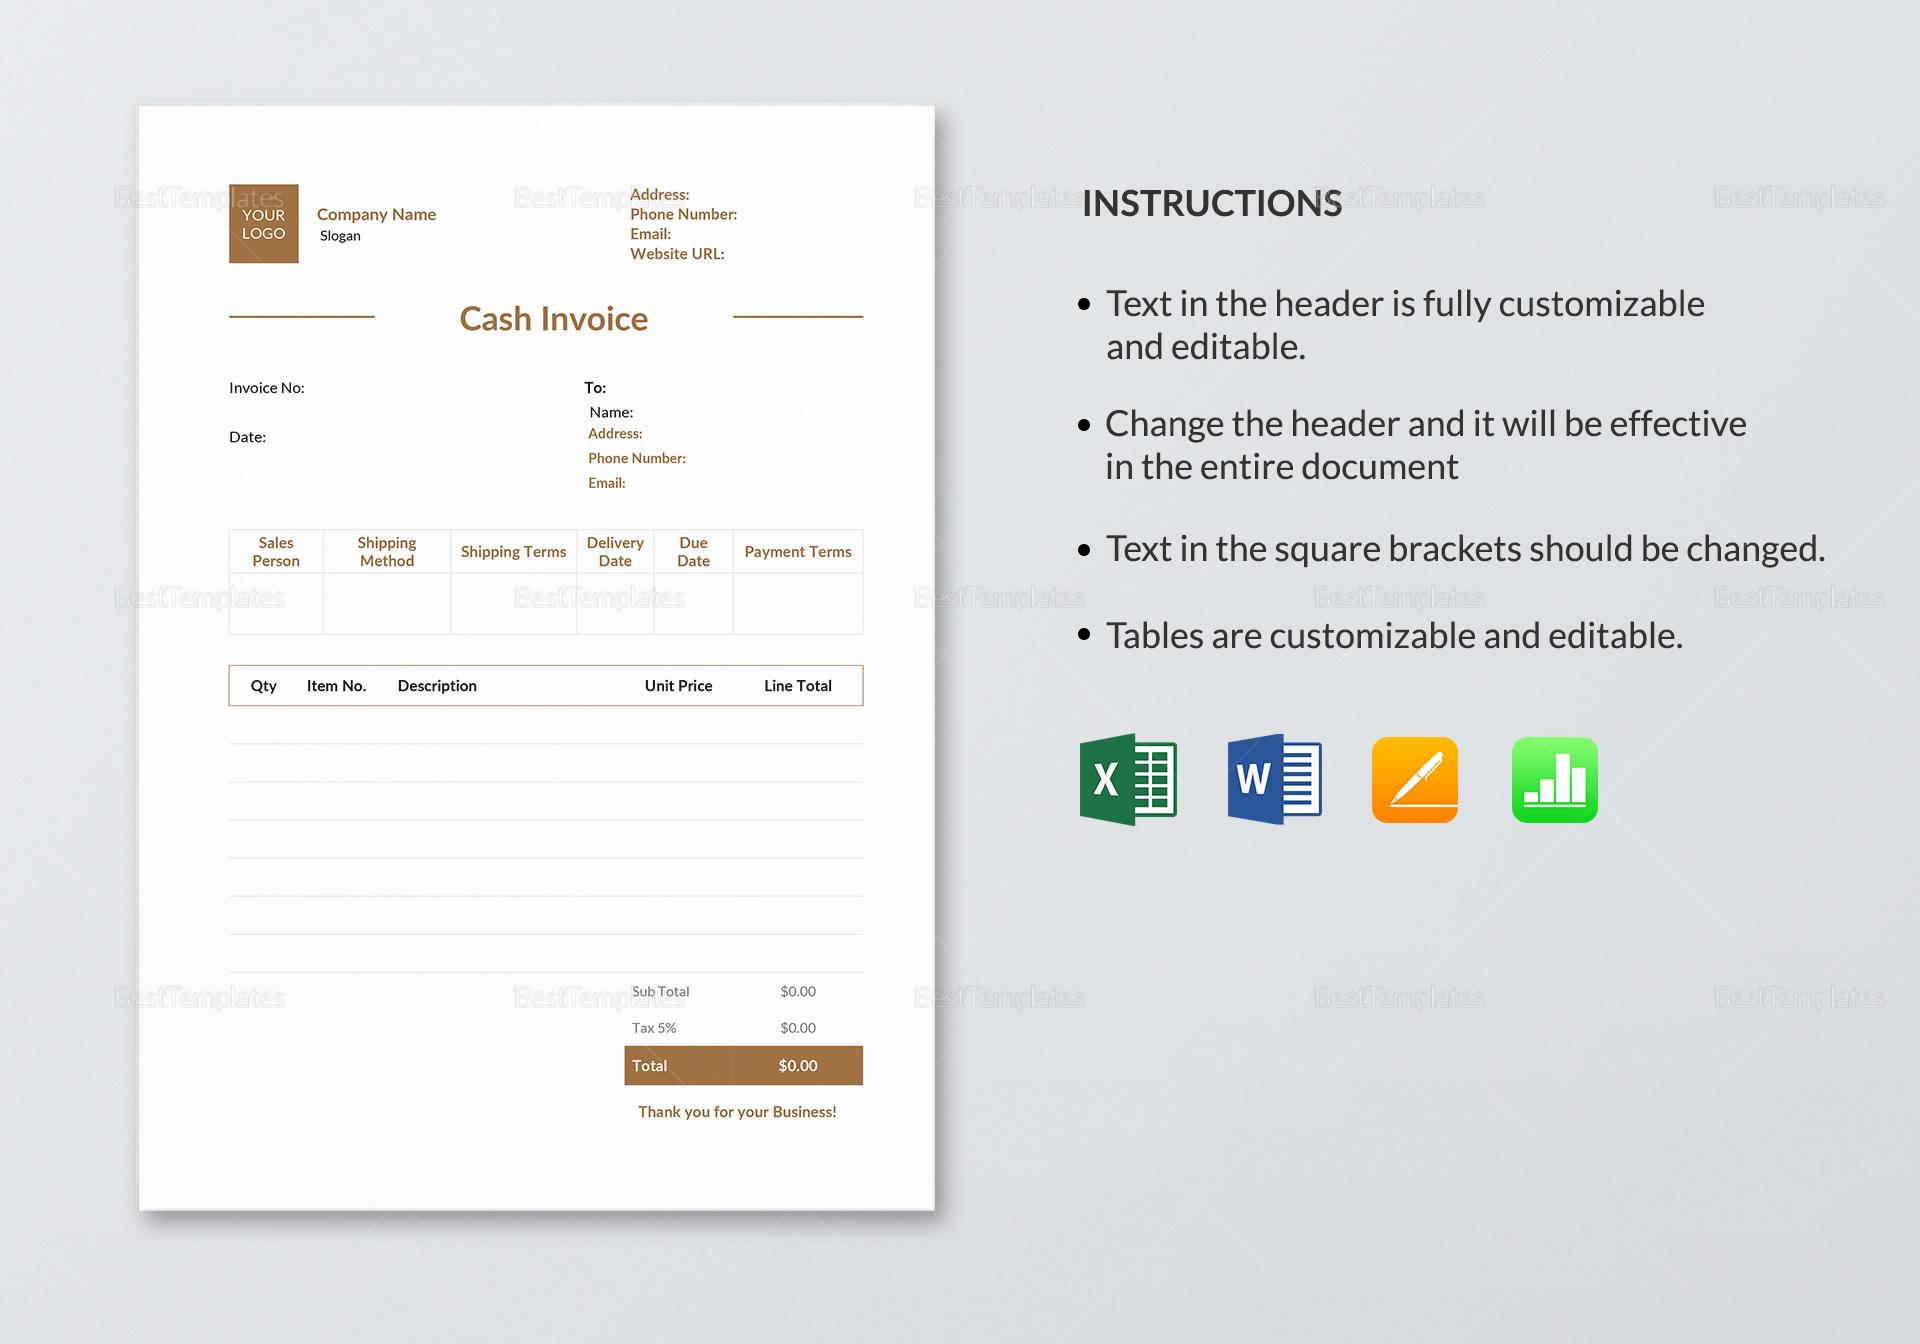 Sample Cash Invoice Template